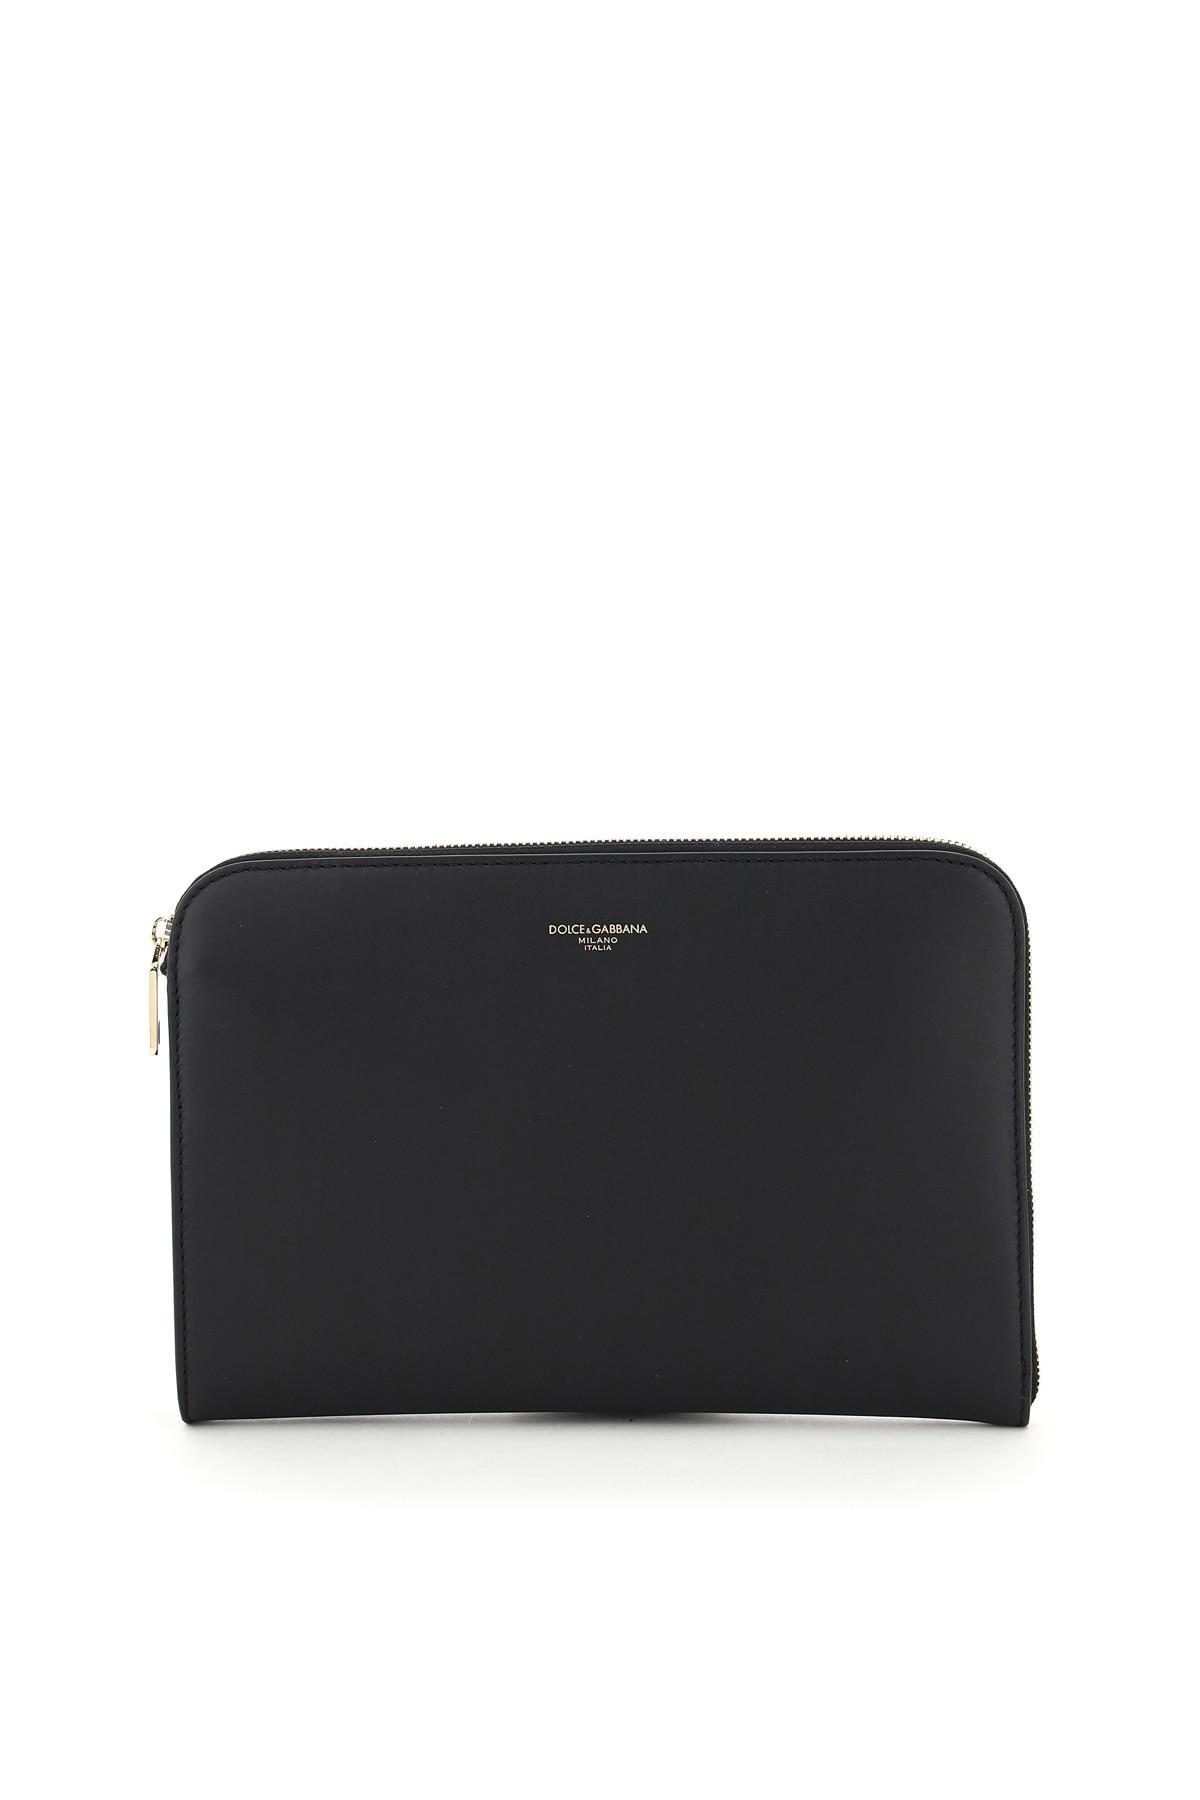 DOLCE & GABBANA ZIPPED CALFSKIN POUCH OS Black Leather